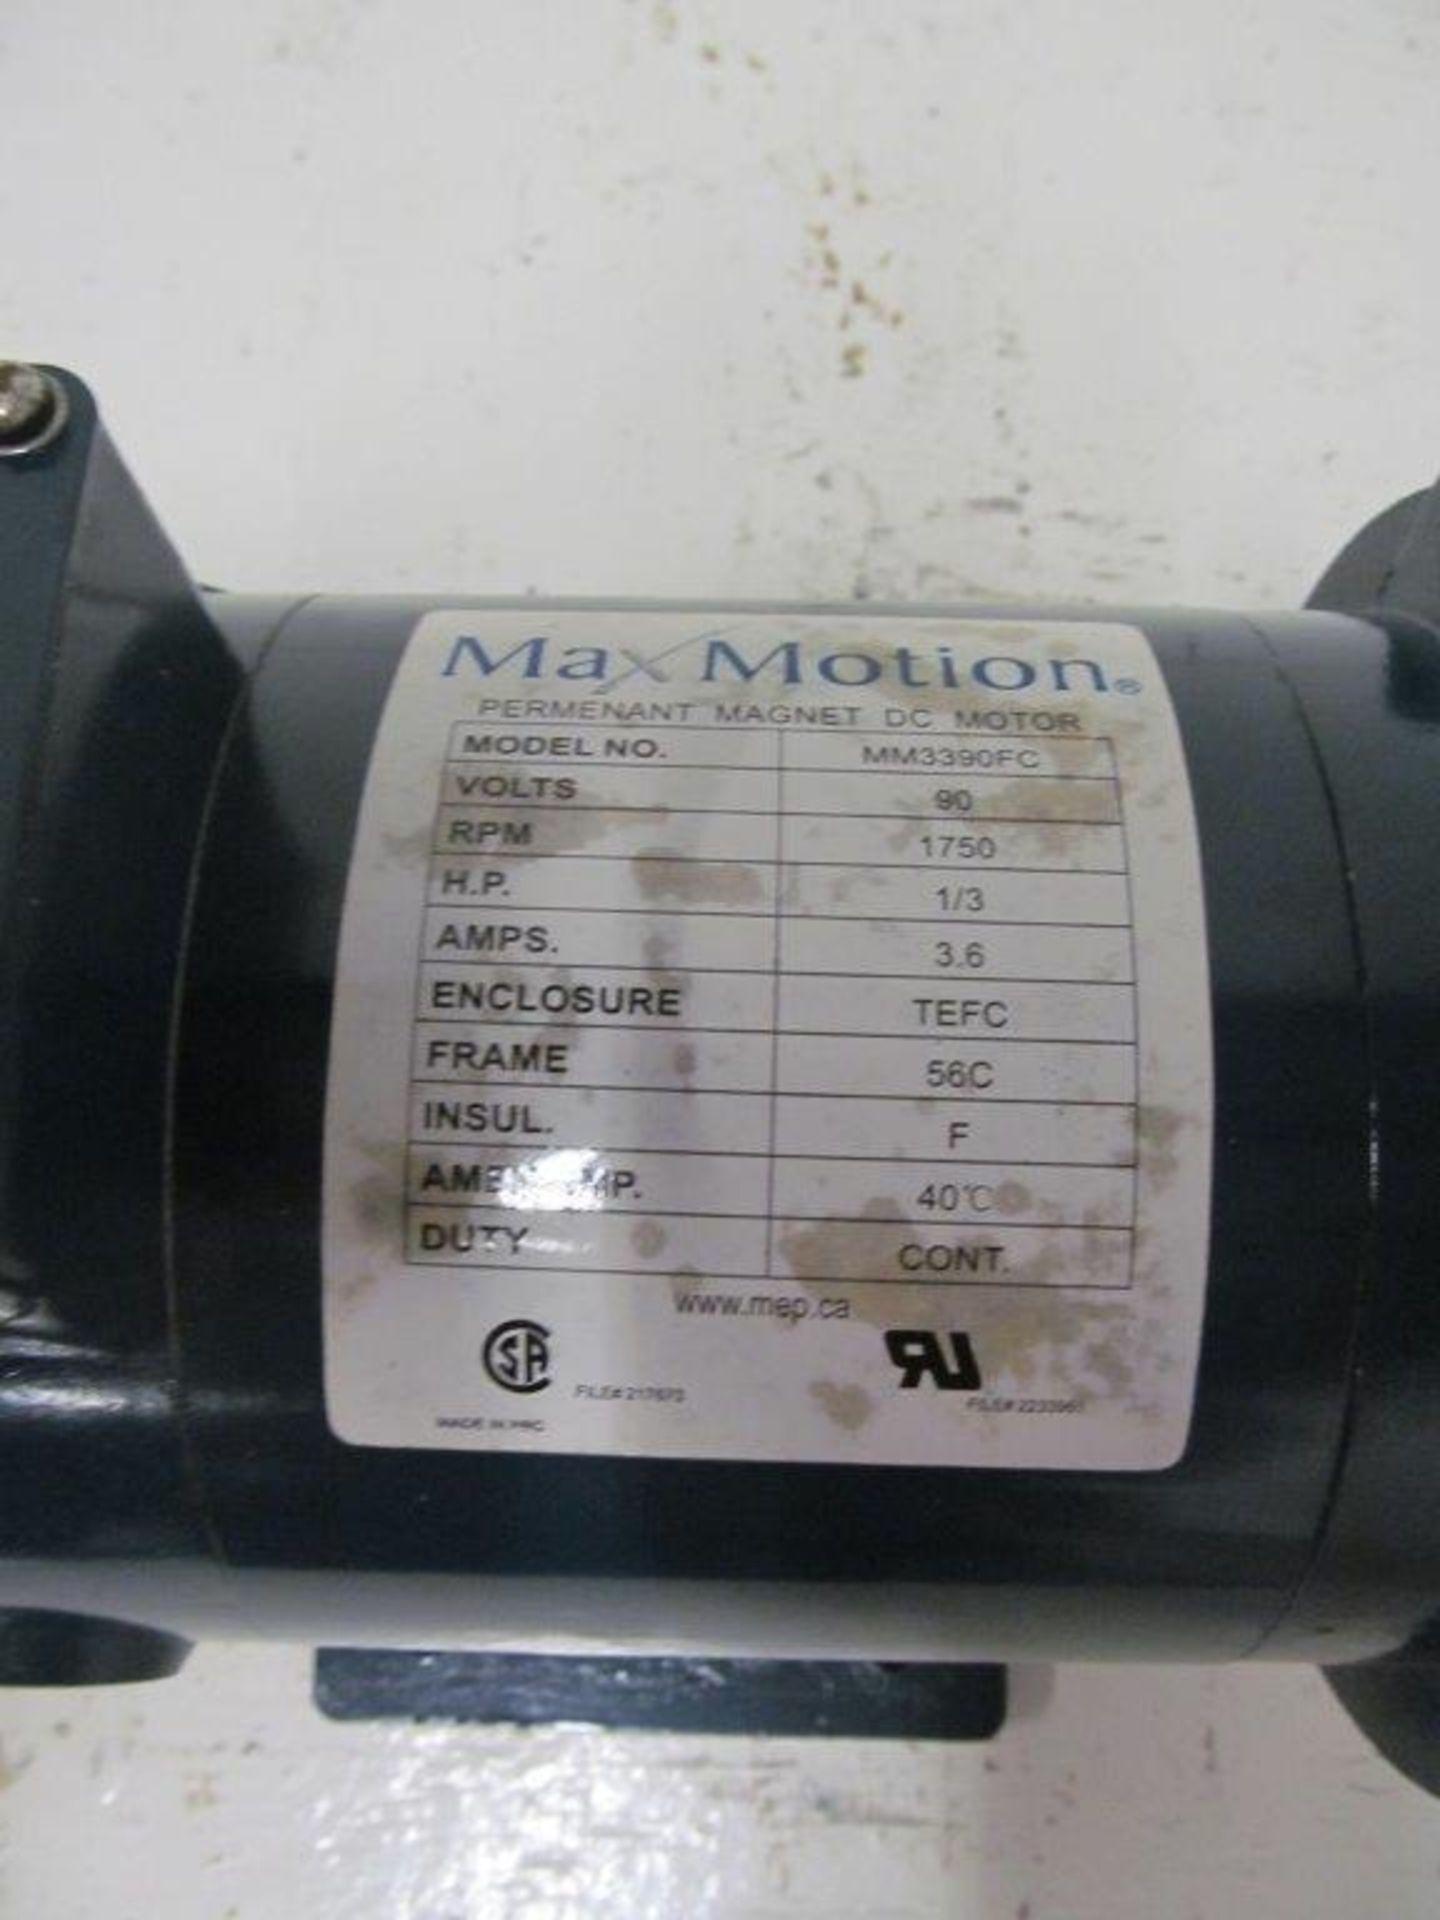 Lot 65 - MAX MOTION DC MOTOR, MODEL MM3390FC, 90V, 1/3HP, RPM 1750 - LOCATION, HAWKESBURY, ONTARIO